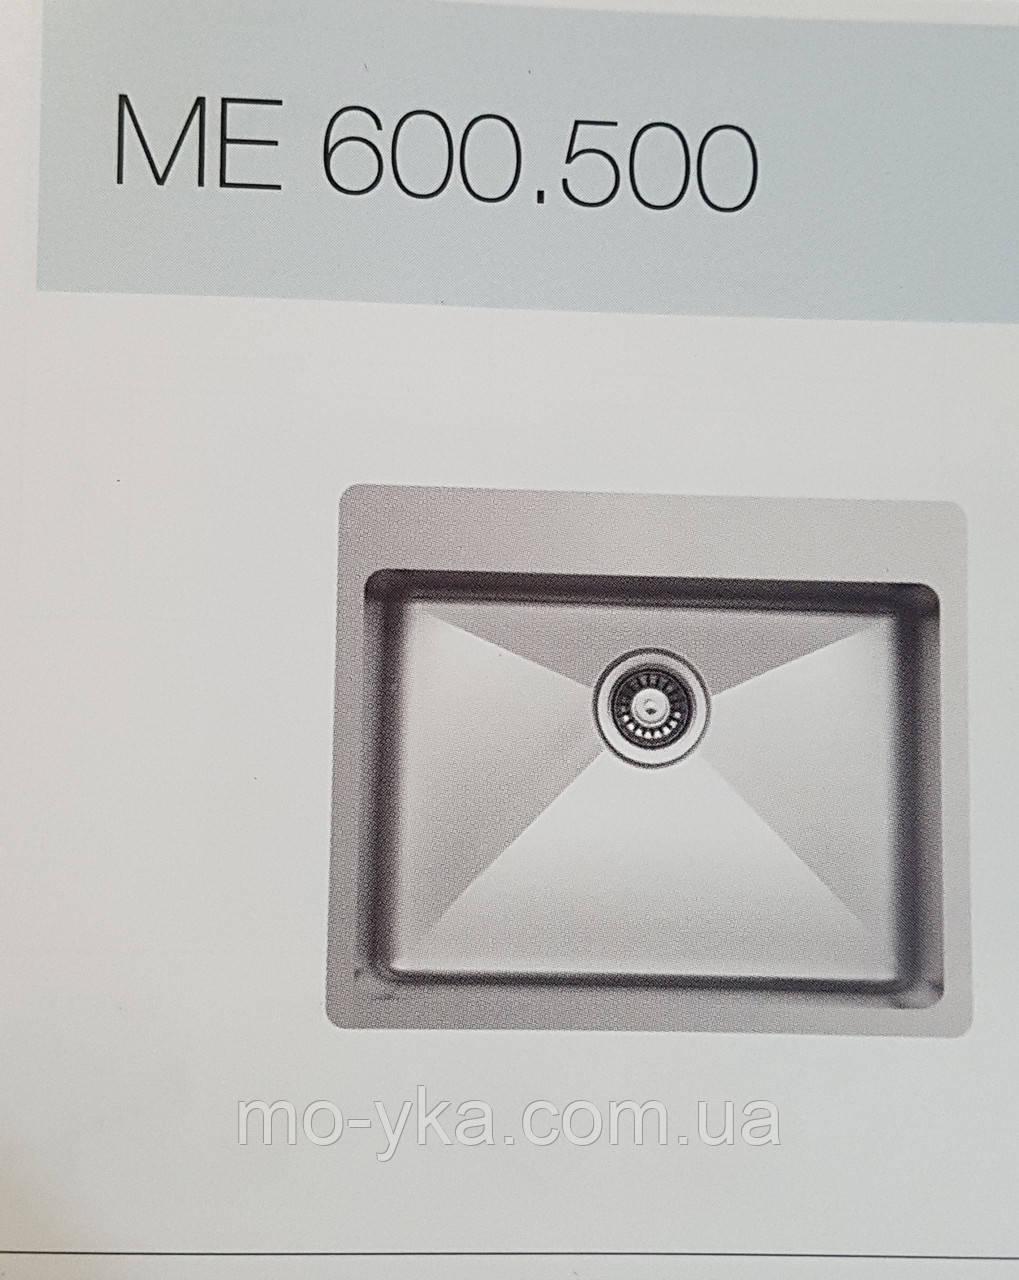 Кухонная мойка Ukinox ME 600.500